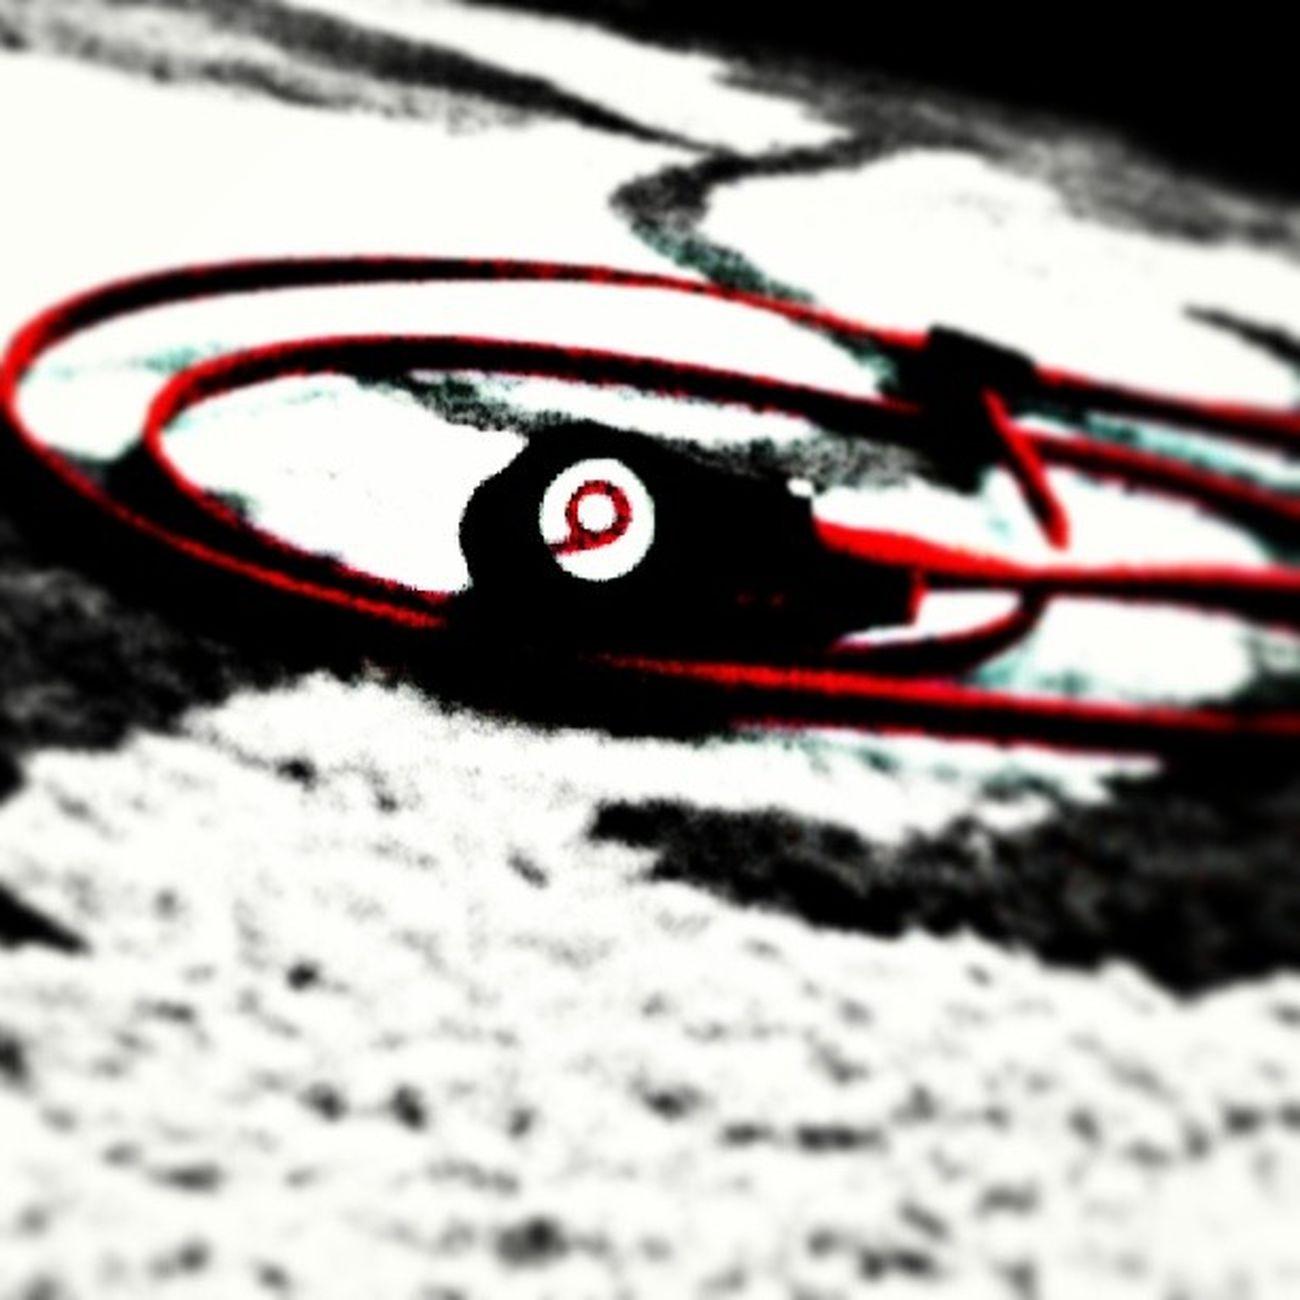 BeatsAudio Instrumentfrnirvan